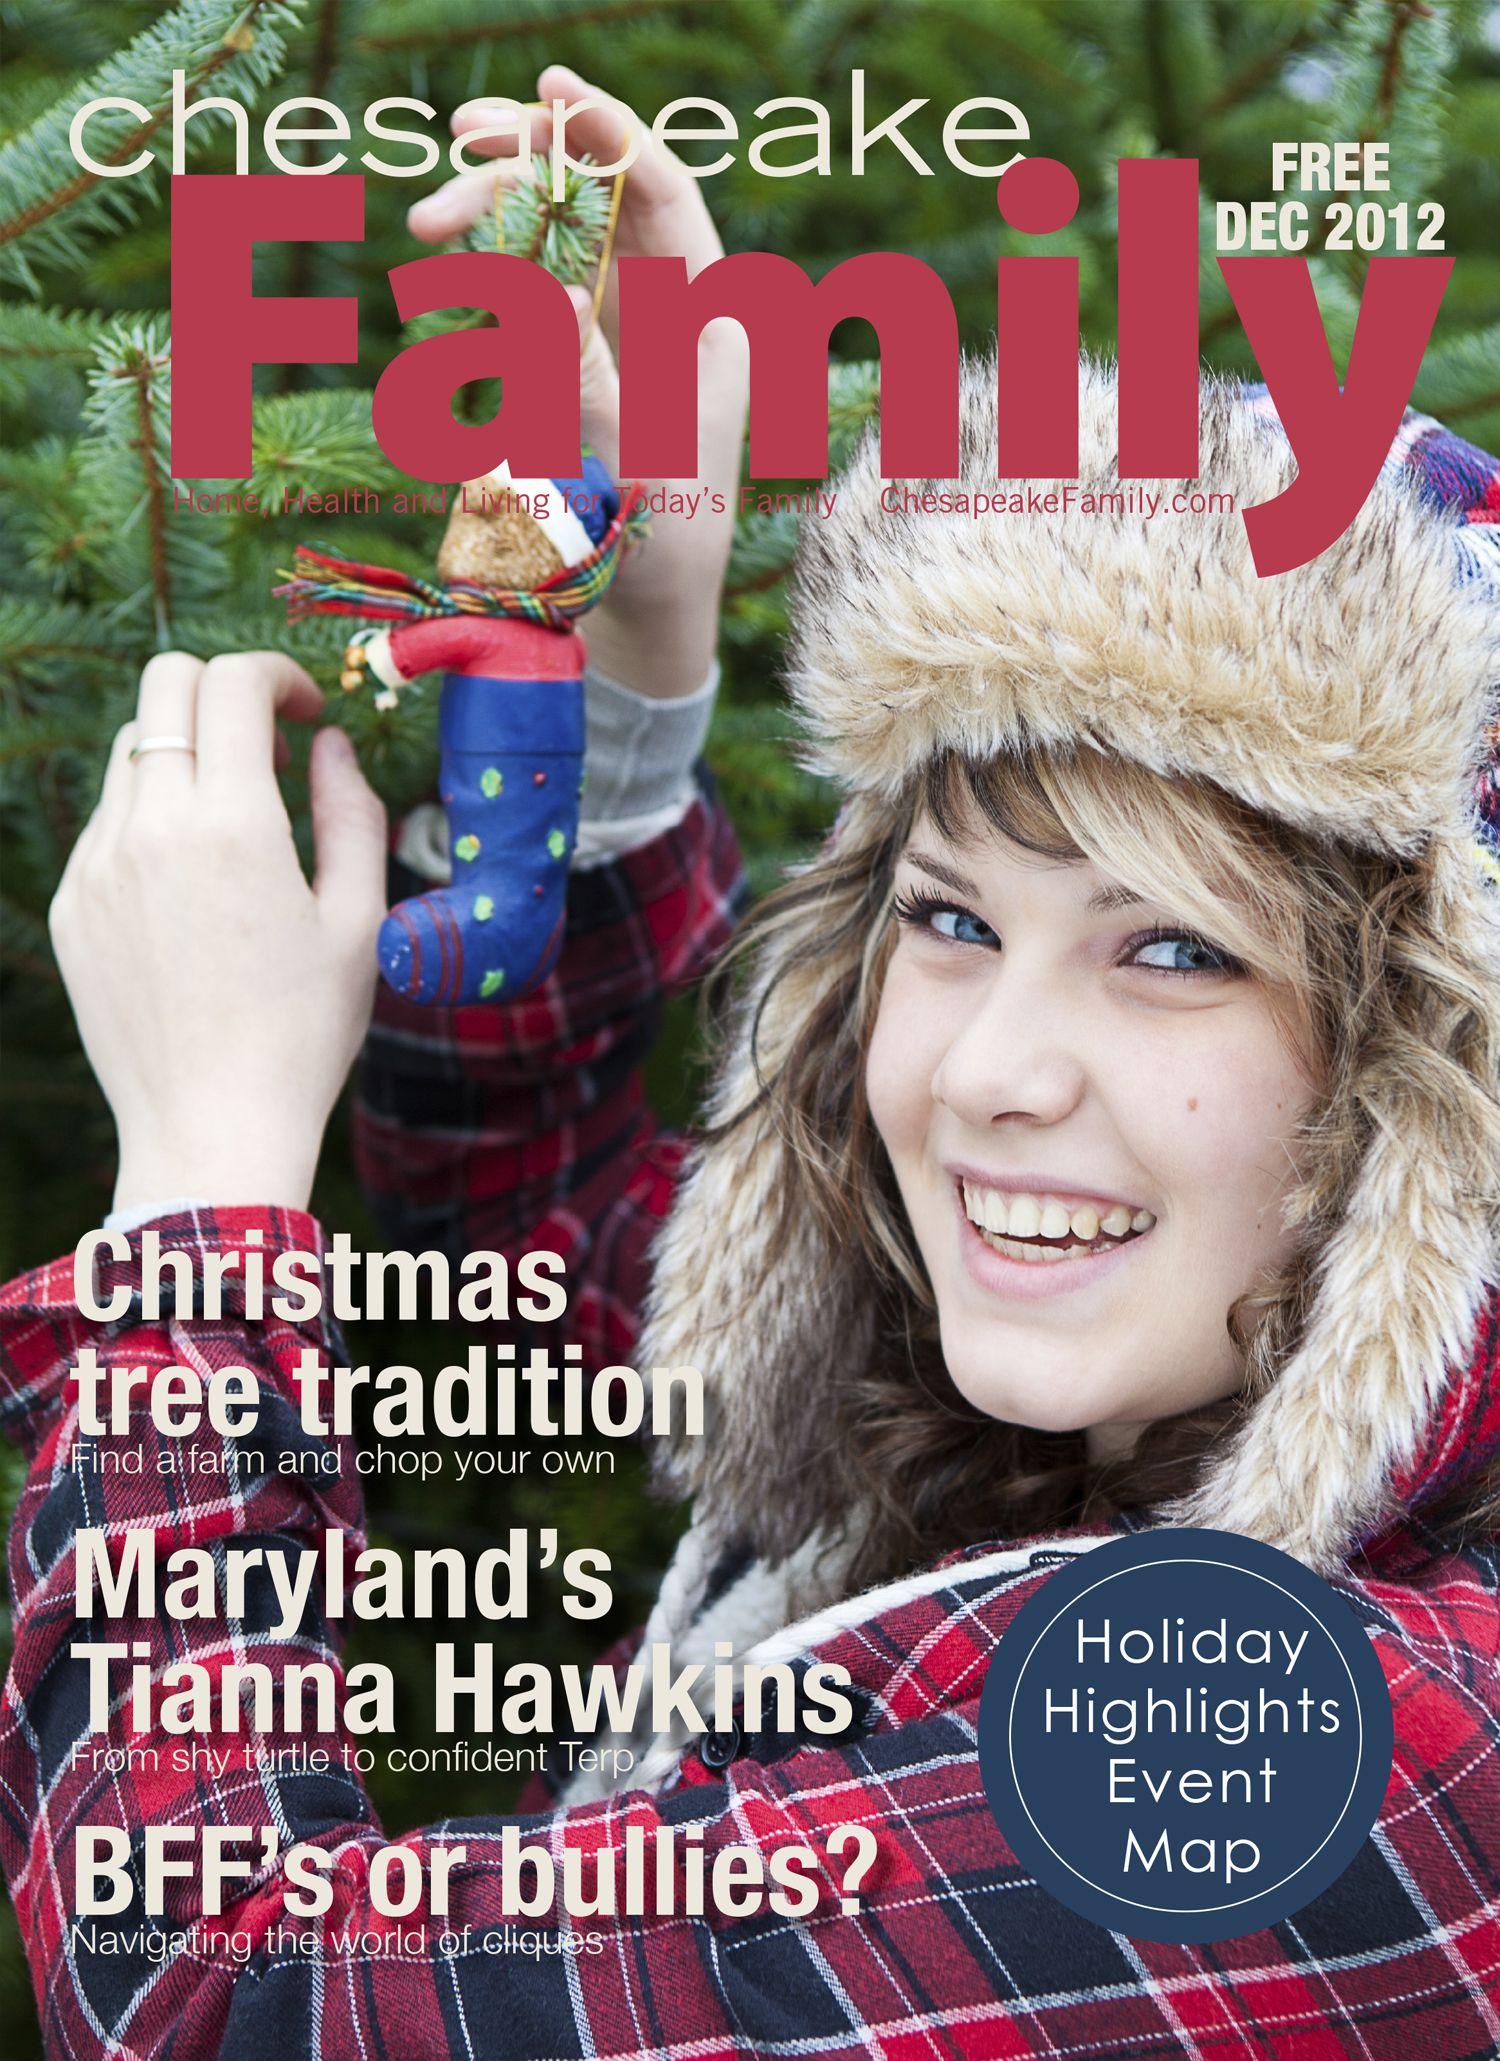 December 2012 holiday specials chesapeake holiday